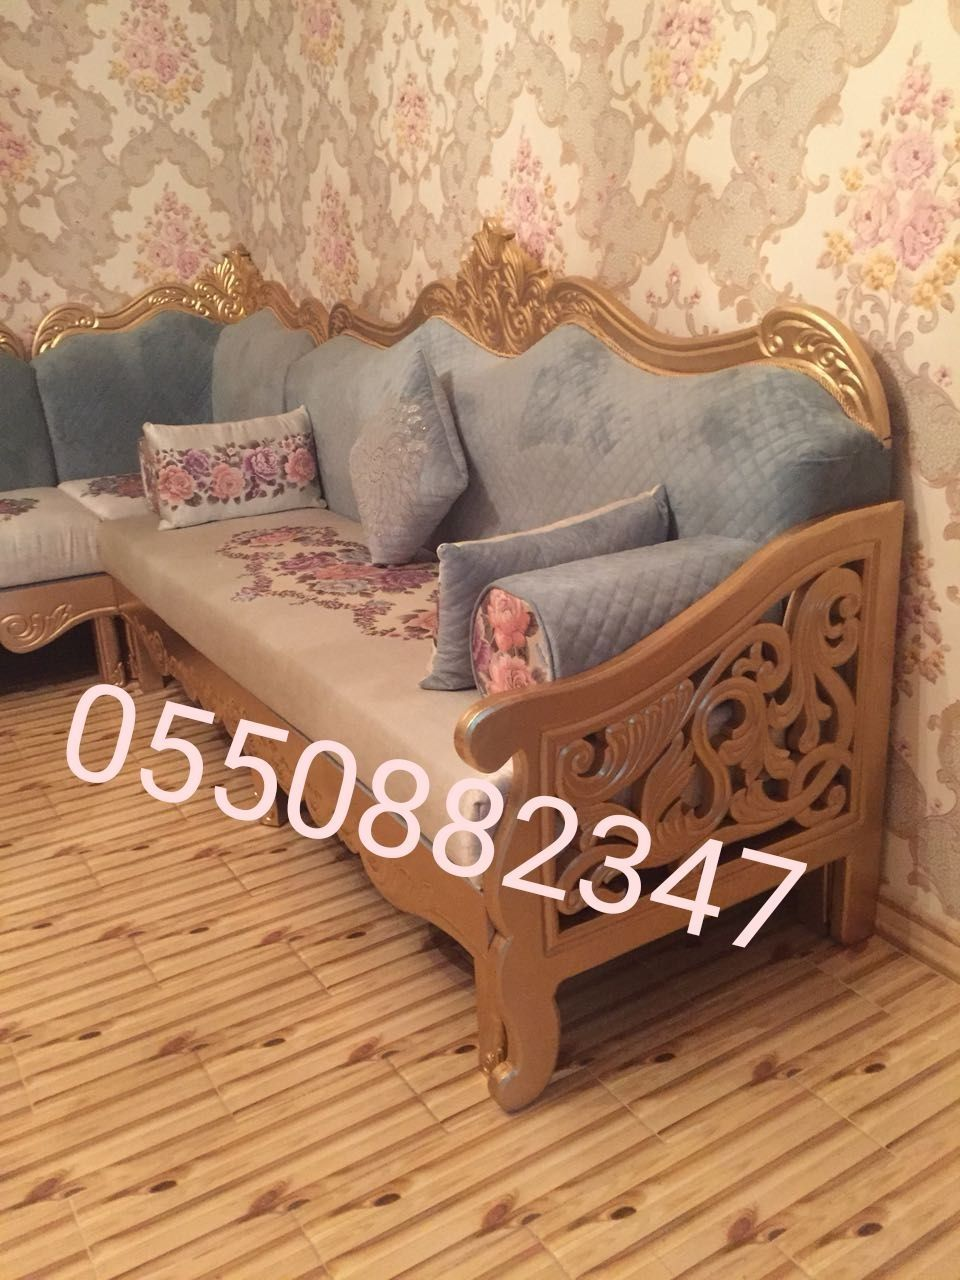 Pin By كراسي جيزانيه On غرفة النوم Home Decor Toddler Bed Furniture